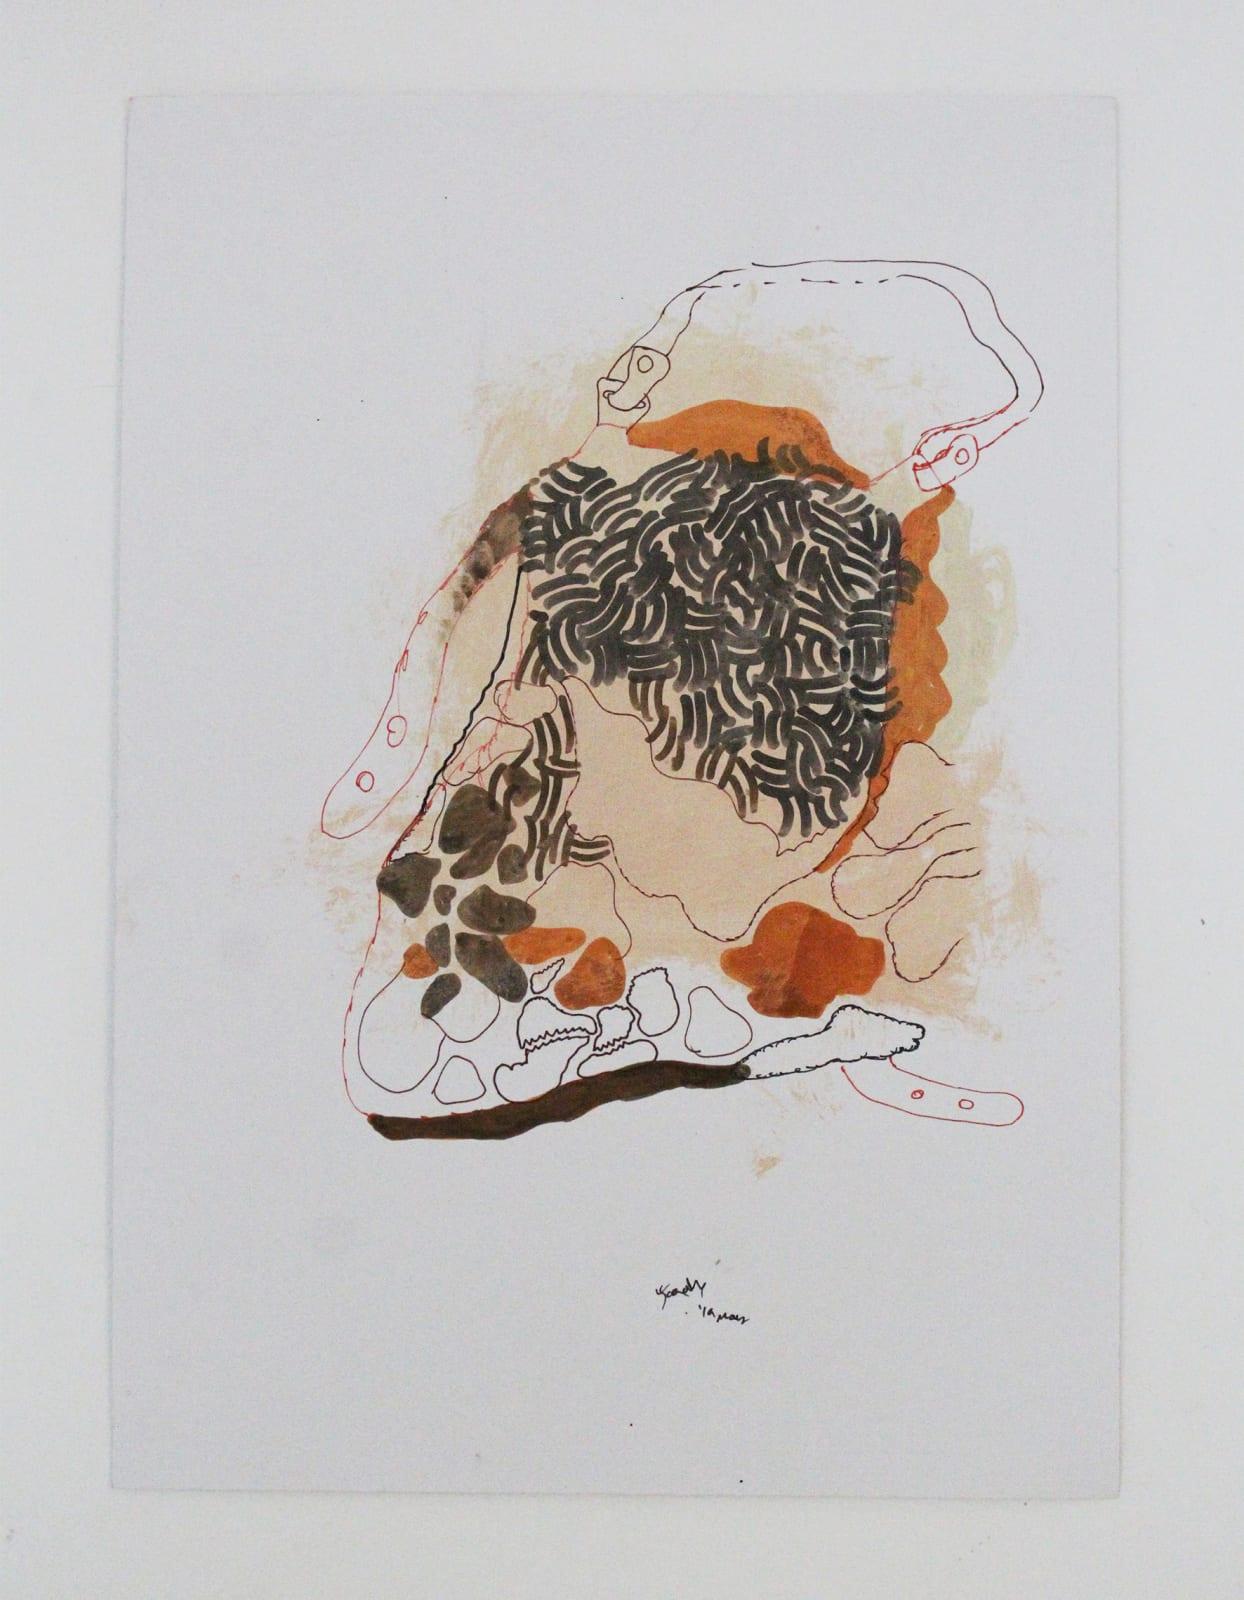 Jagath Weerasinghe, Untitled XV, 2019